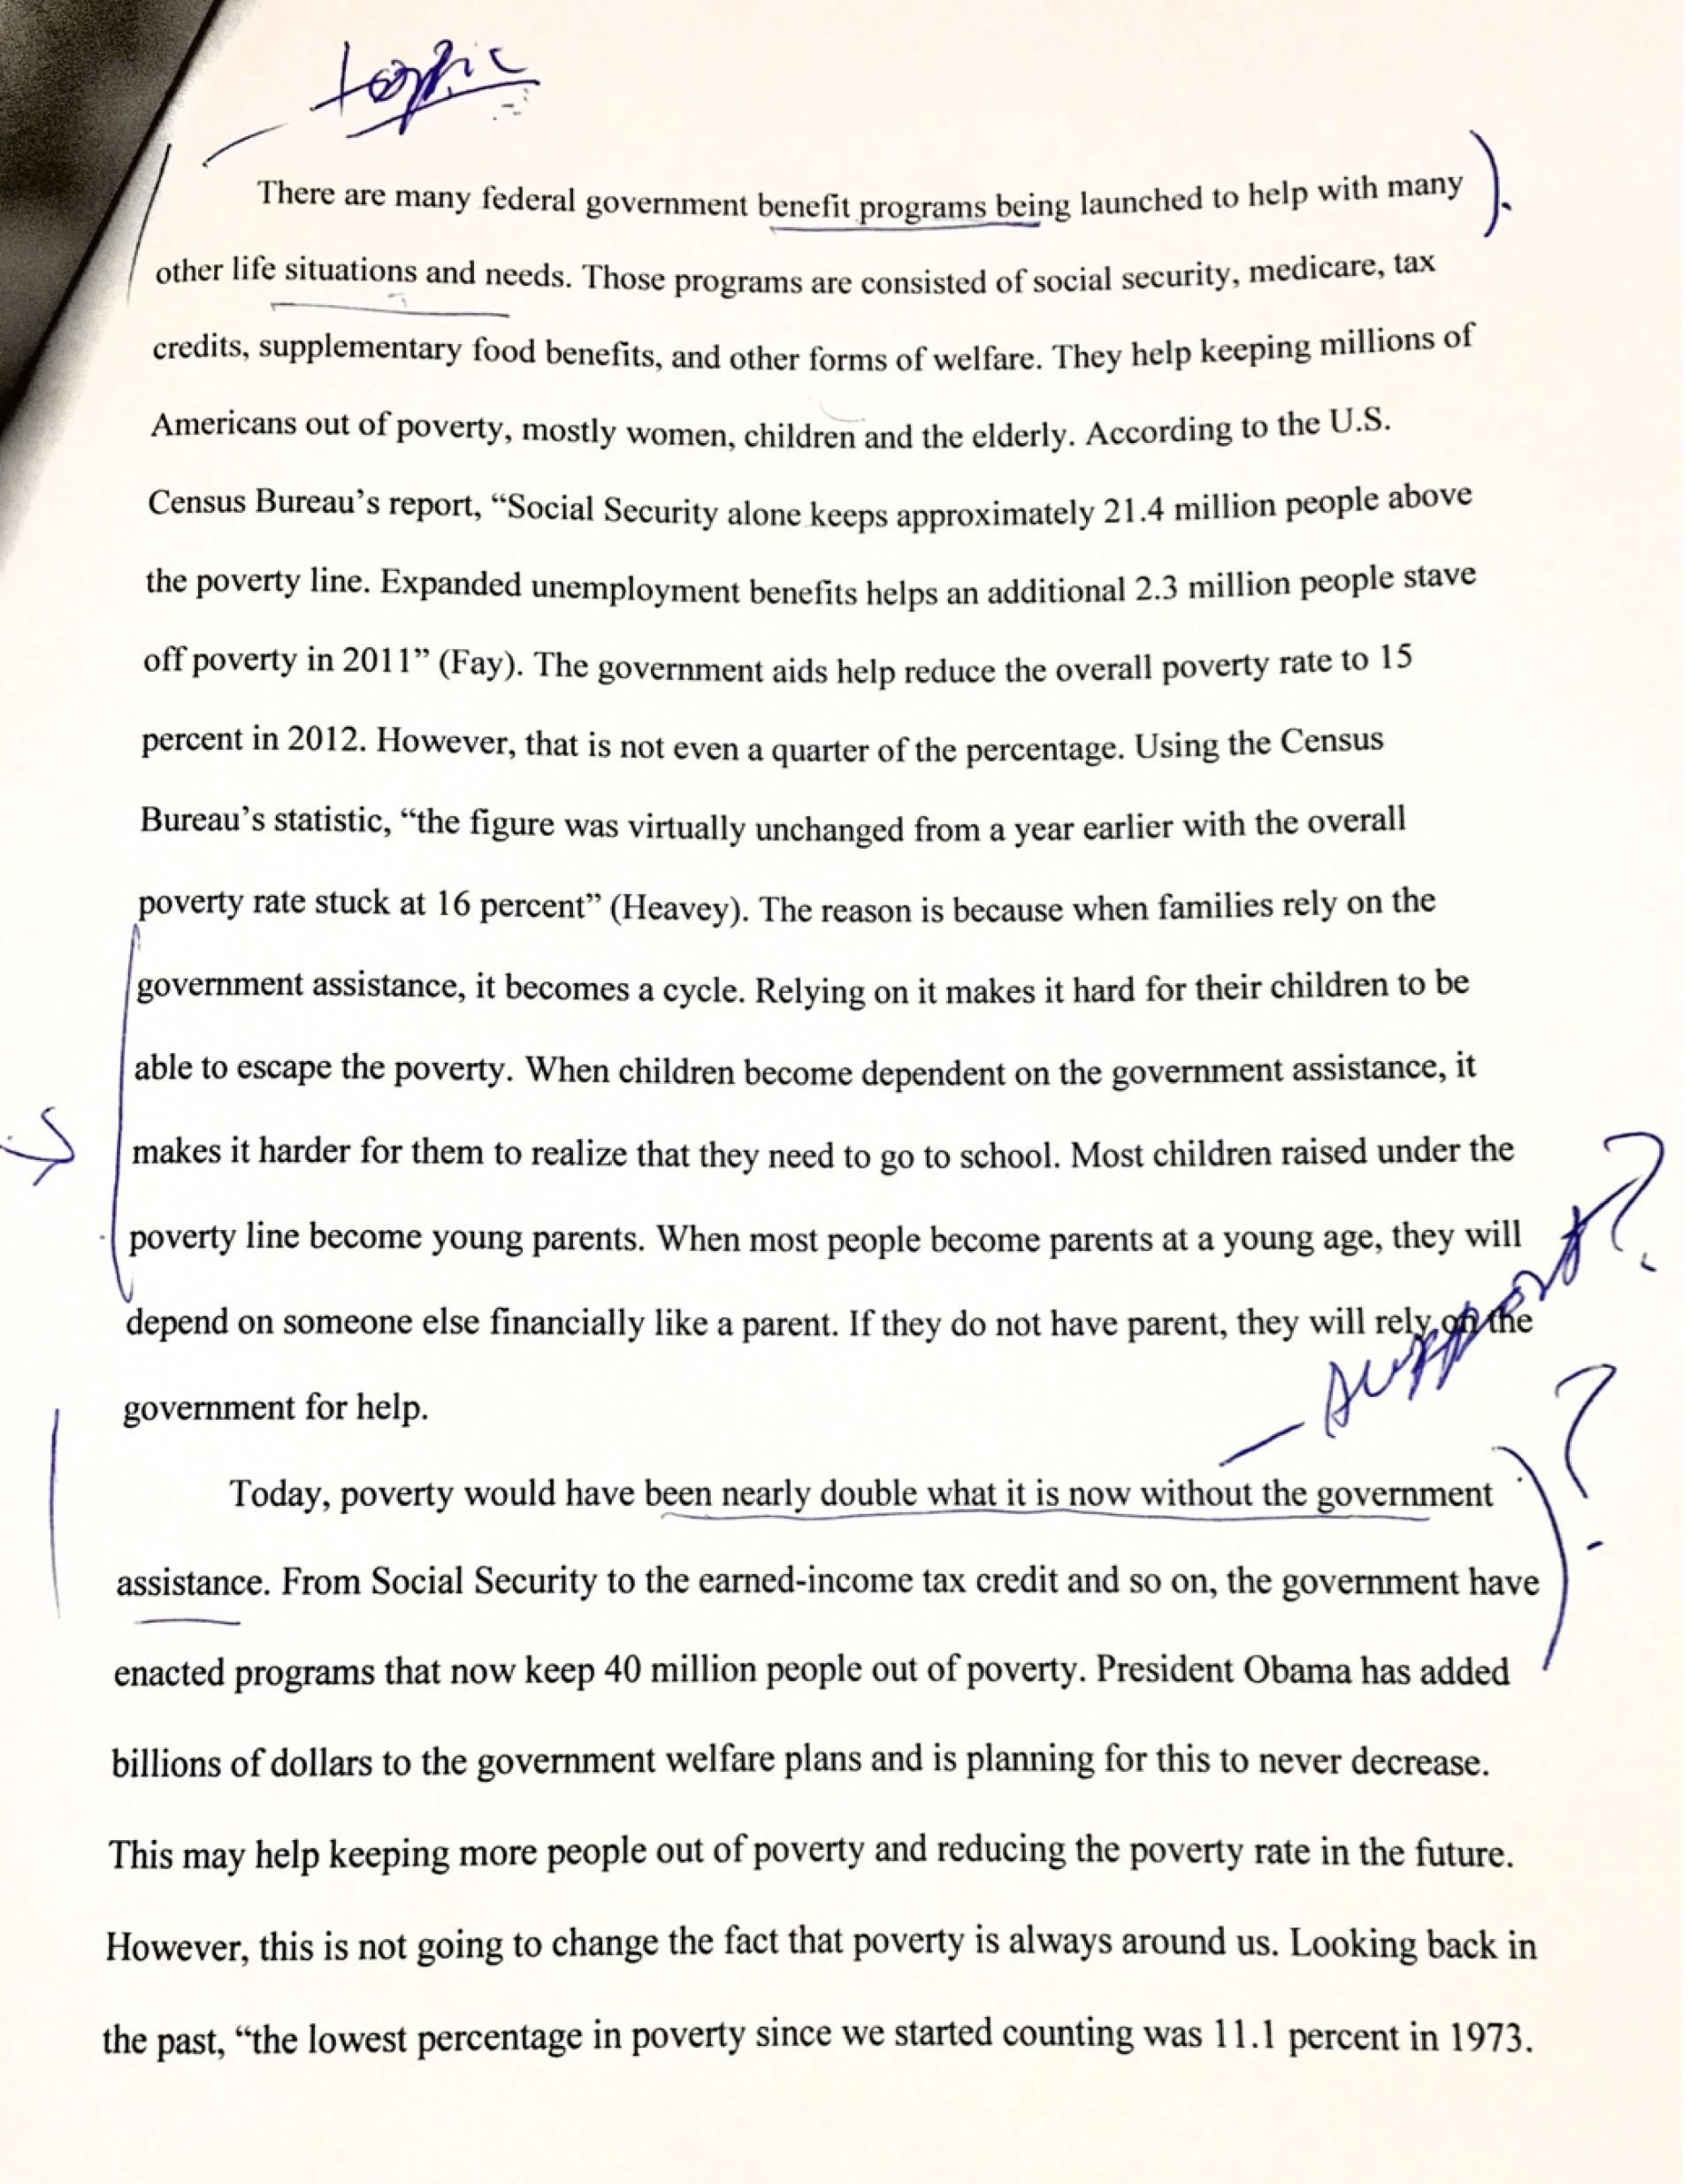 001 Fix My Essay Singular Generator Free Title Online 1920